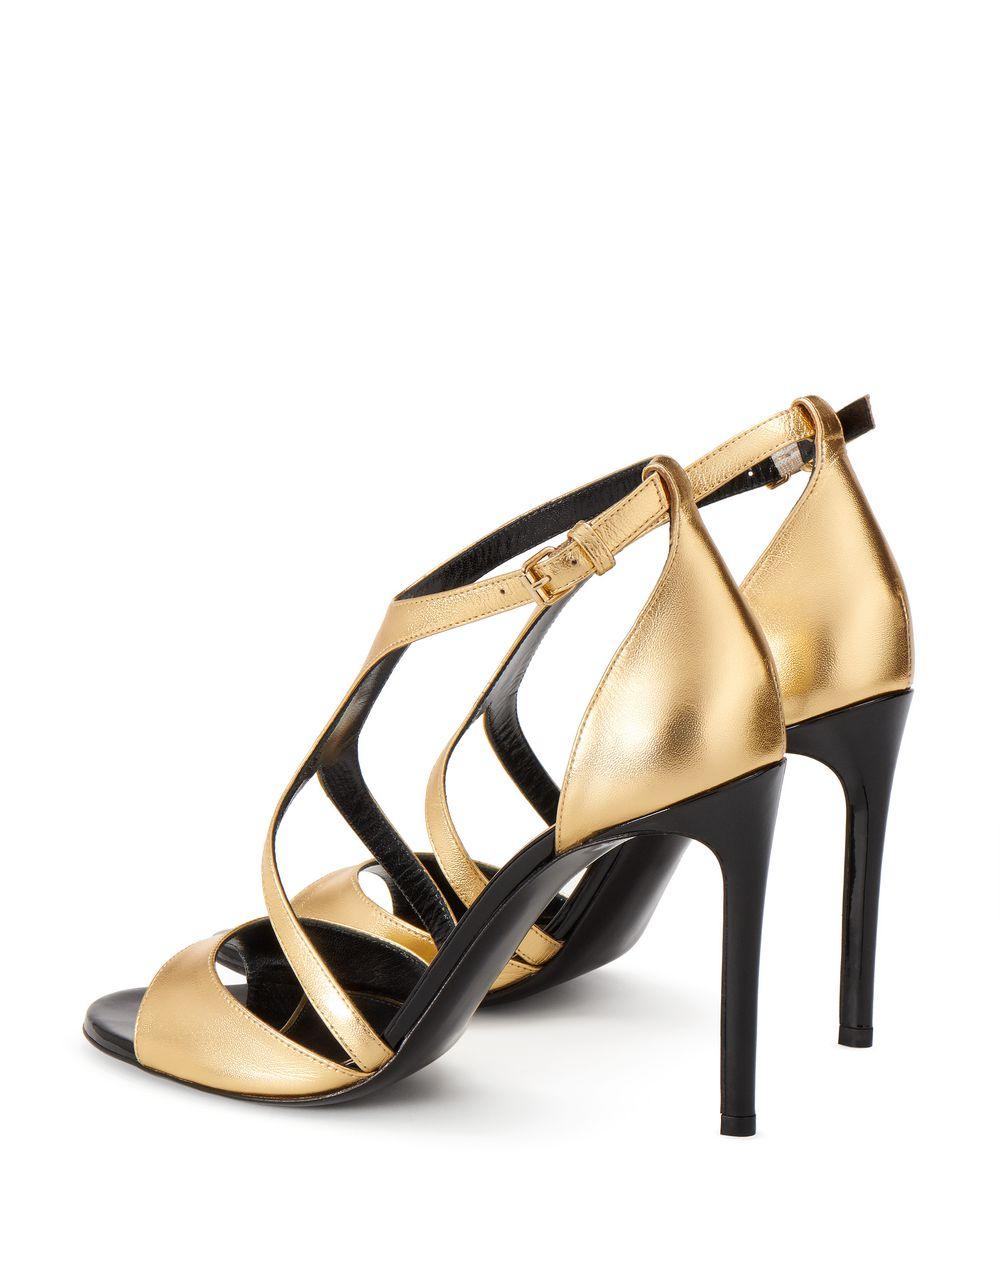 GOLD SANDAL - Lanvin